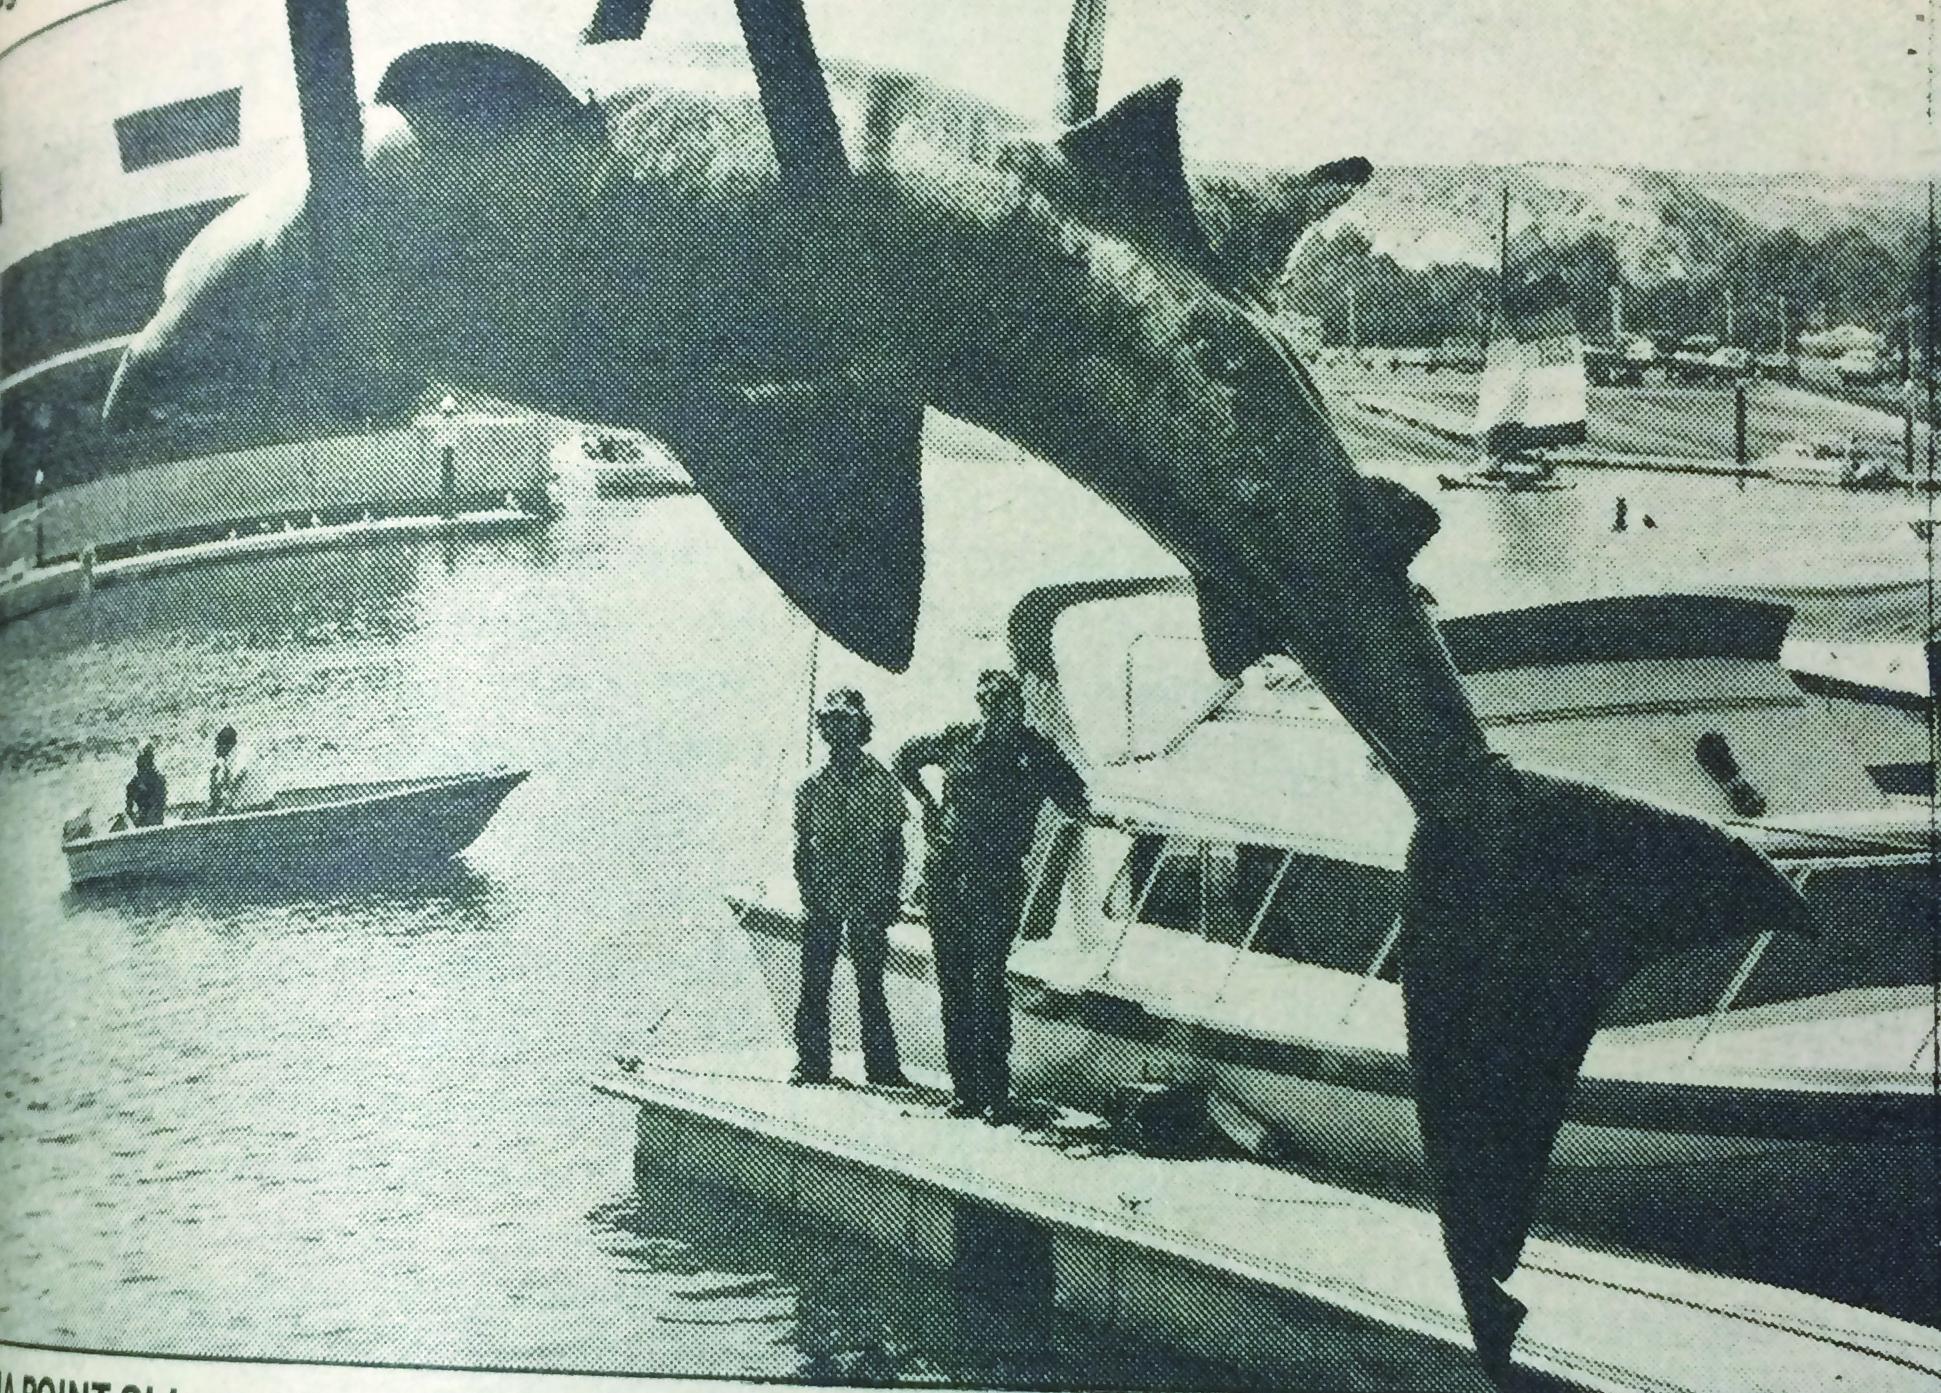 1978: Basking shark found in Dana Point